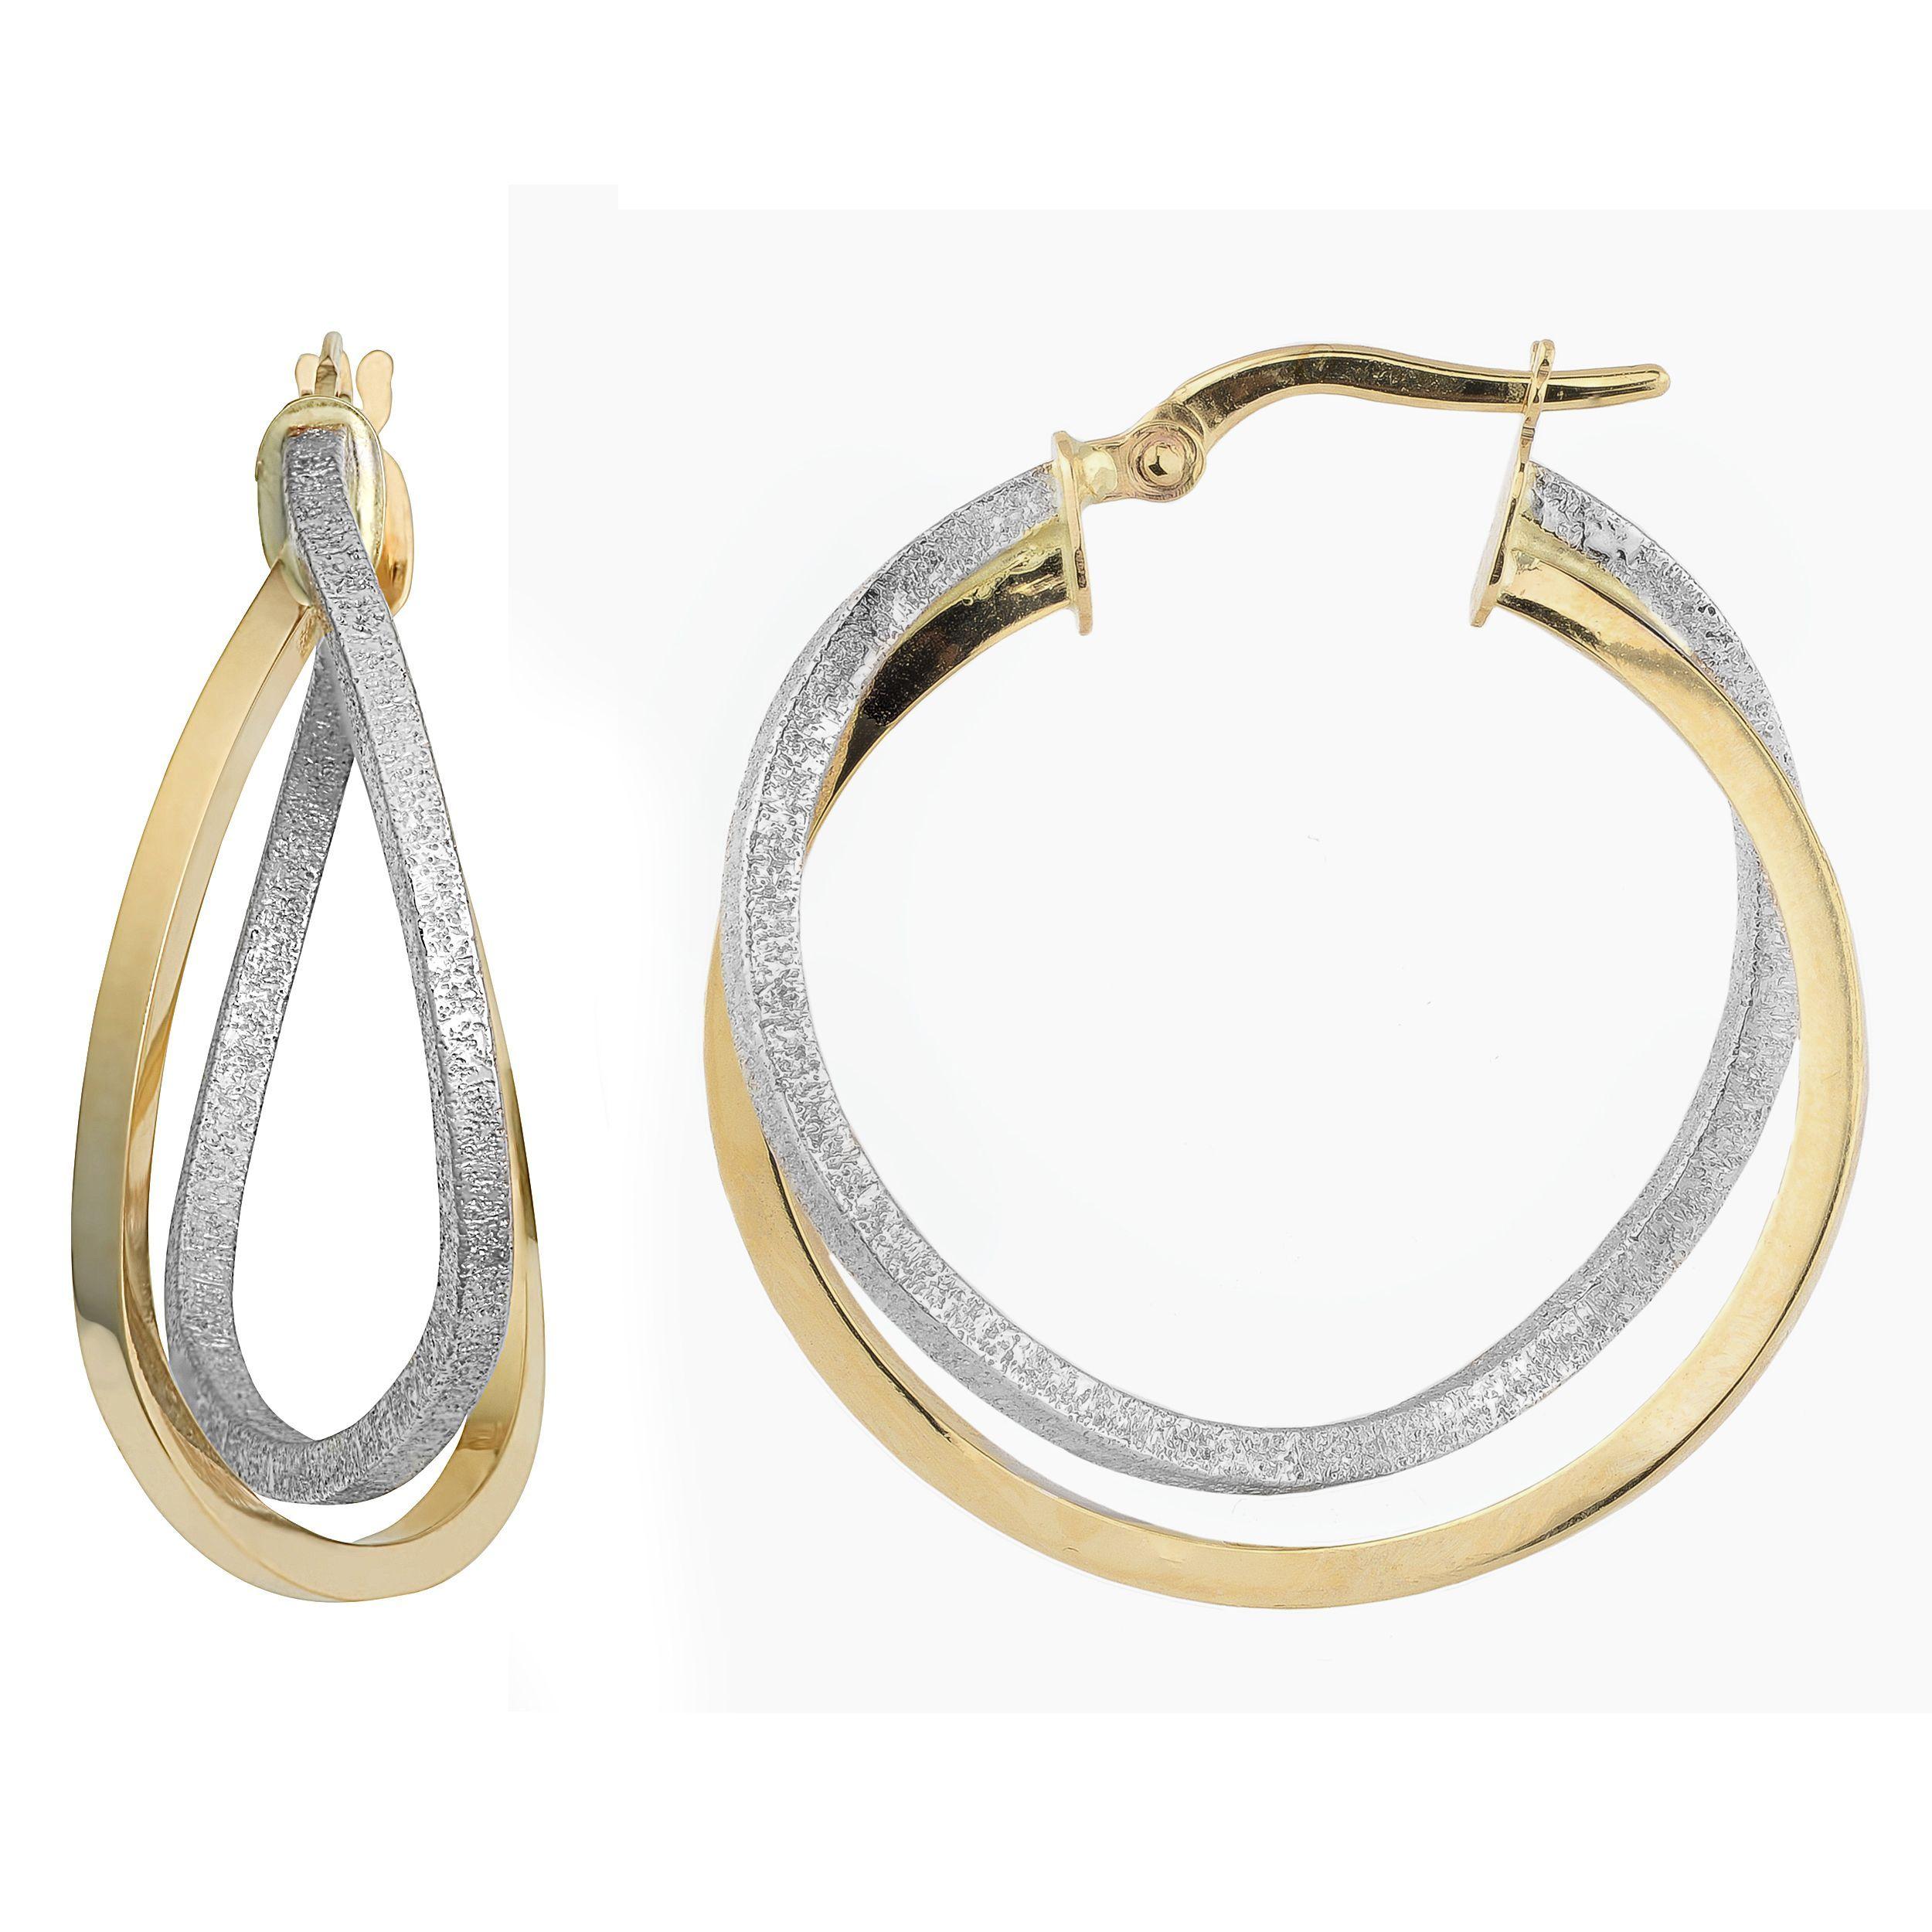 Fremada 10k Gold Overlapping Double Hoop Earrings